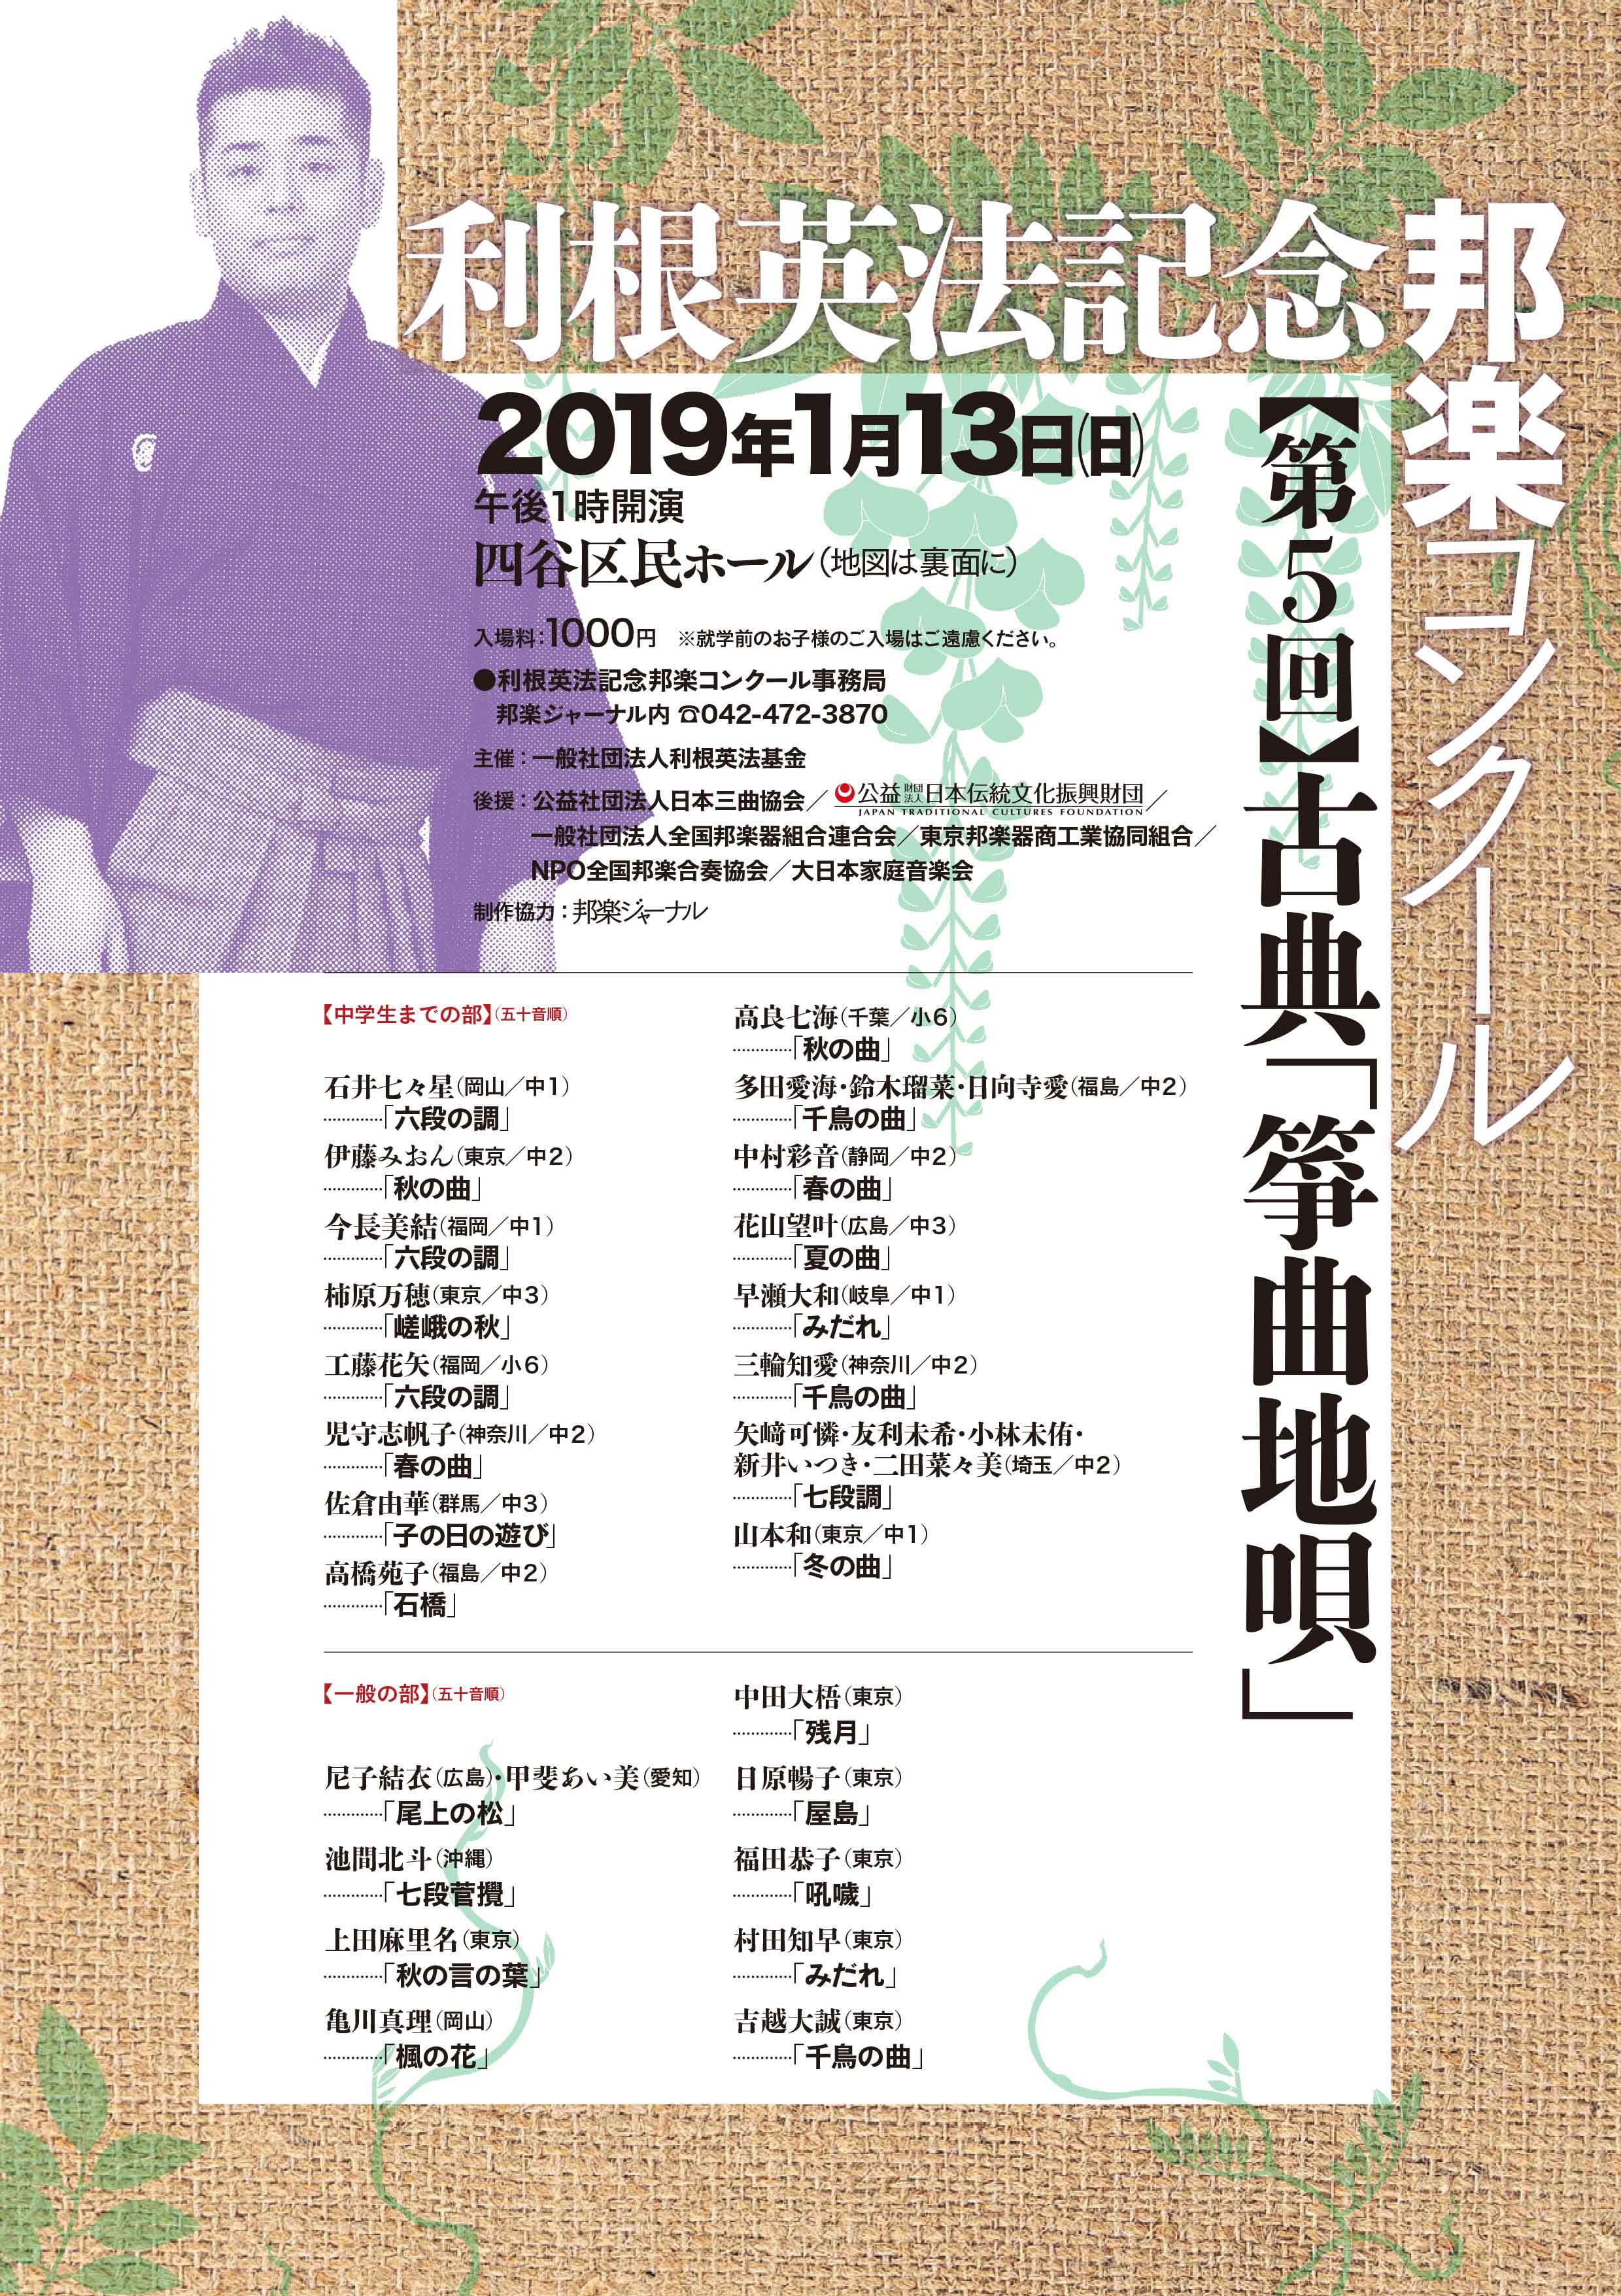 jtcf.jp – 公演